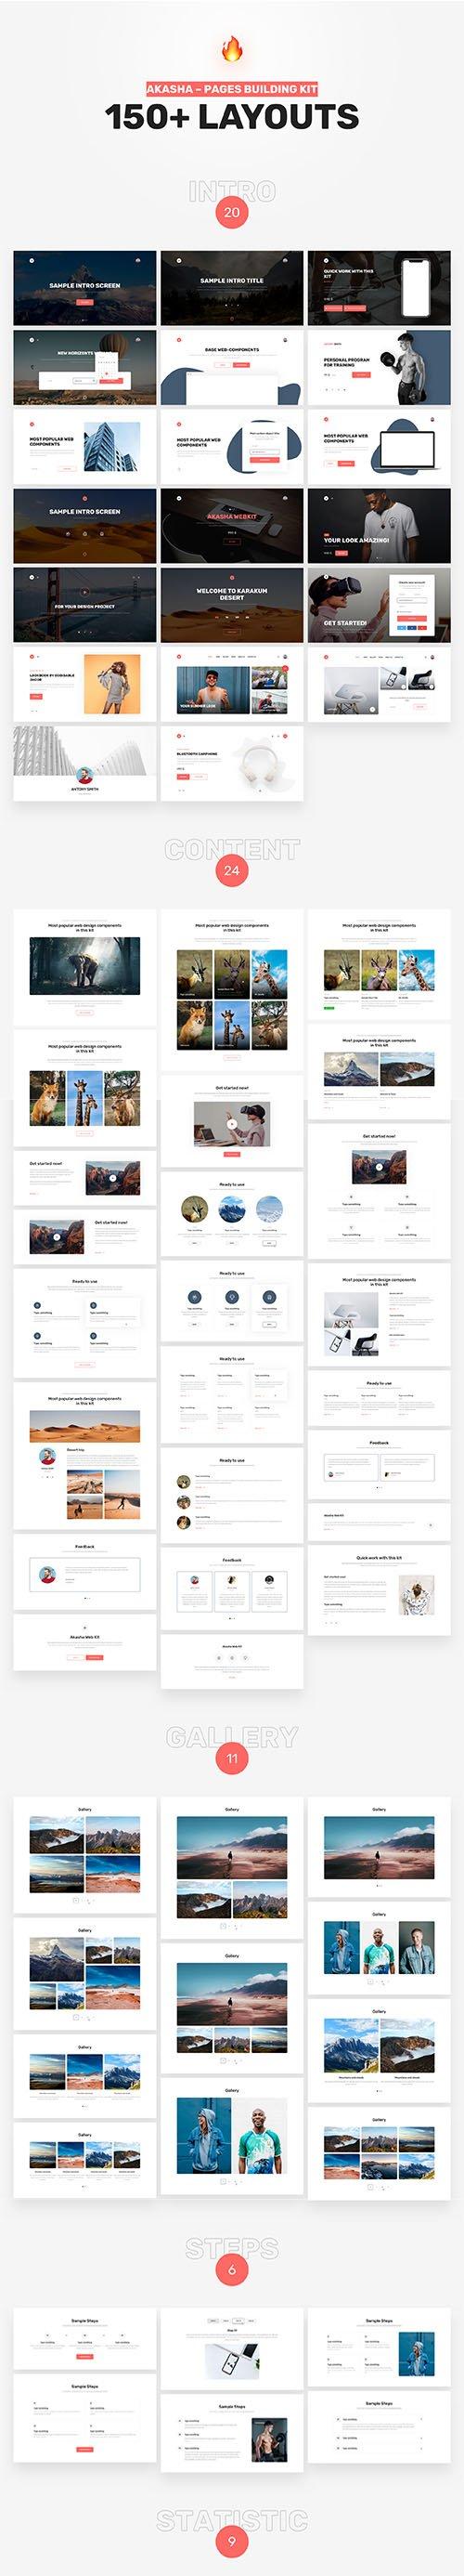 AKASHA Pages Building Kit